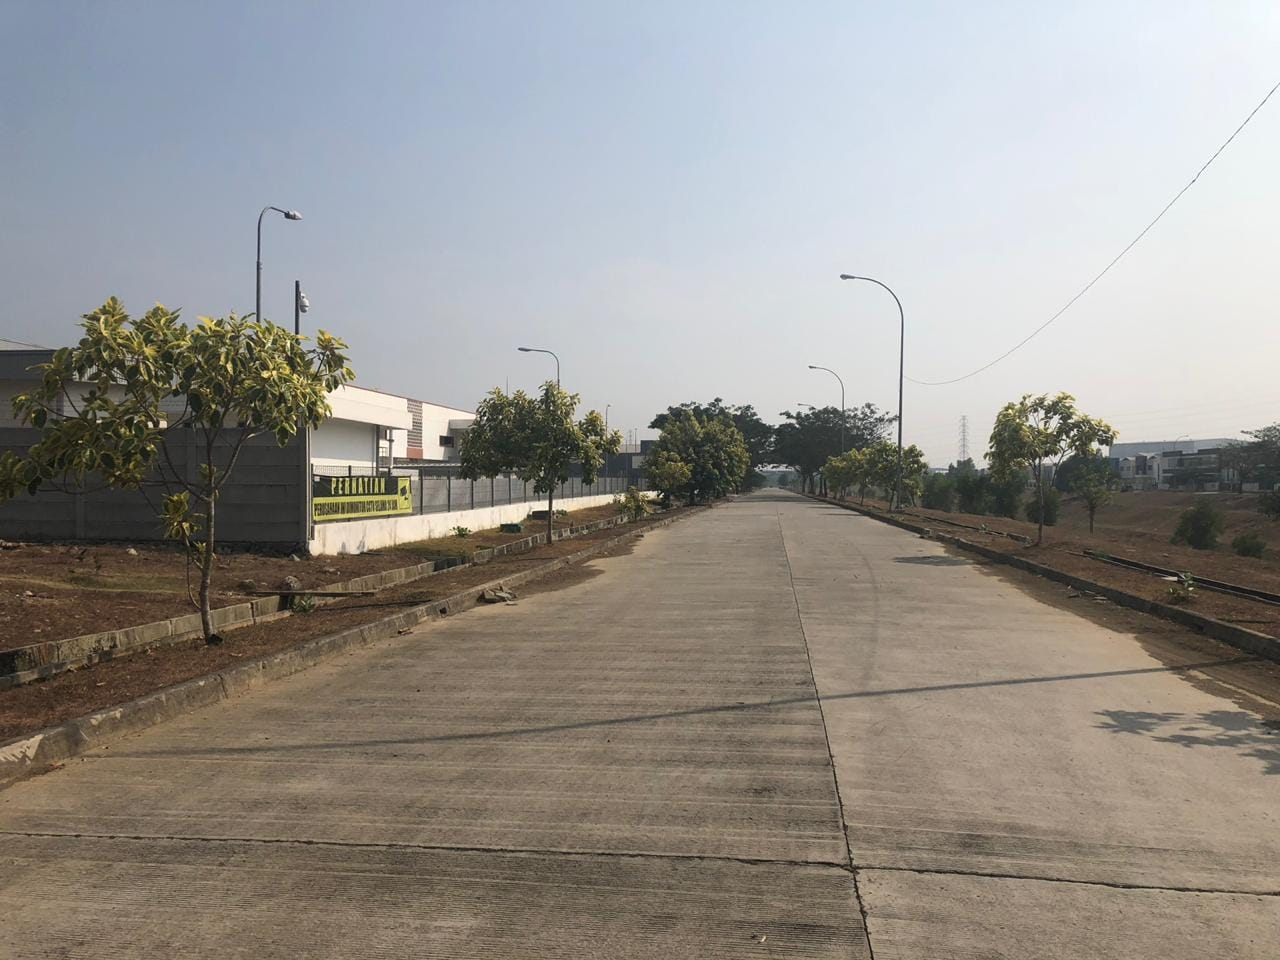 Lahan Industri Delta Silicon 3 Lippo Cikarang, Dekat Hankook